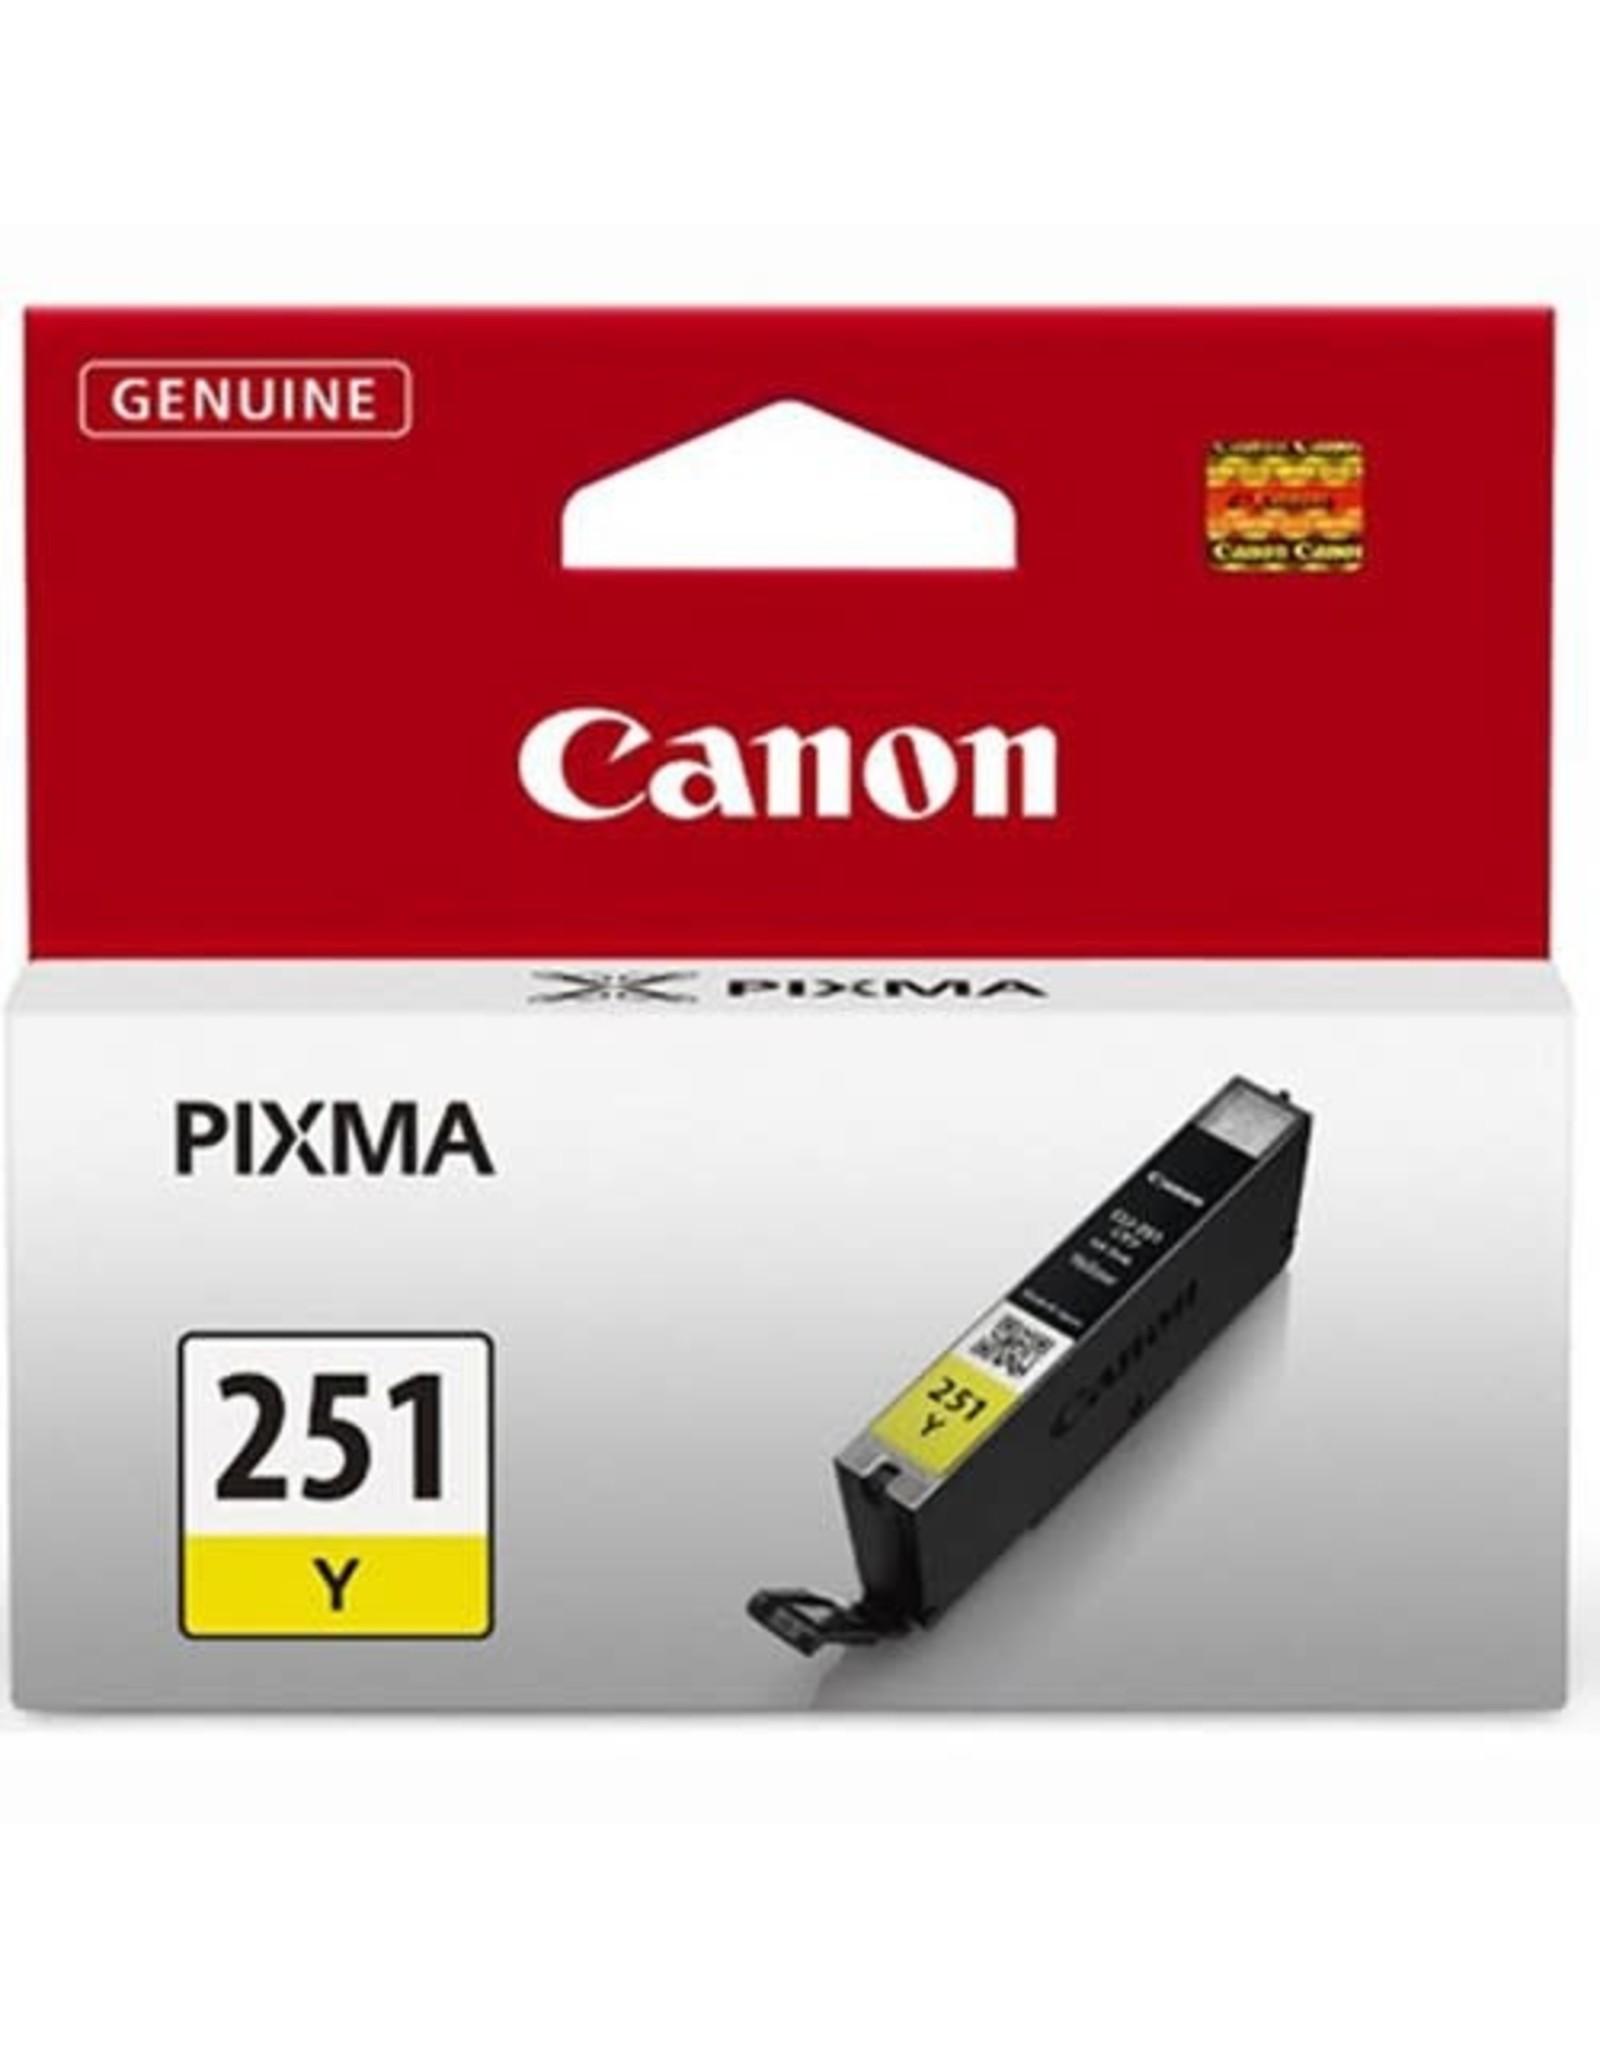 SYNNEX INK TANK-CANON #CLI251Y YELLOW -6516B001